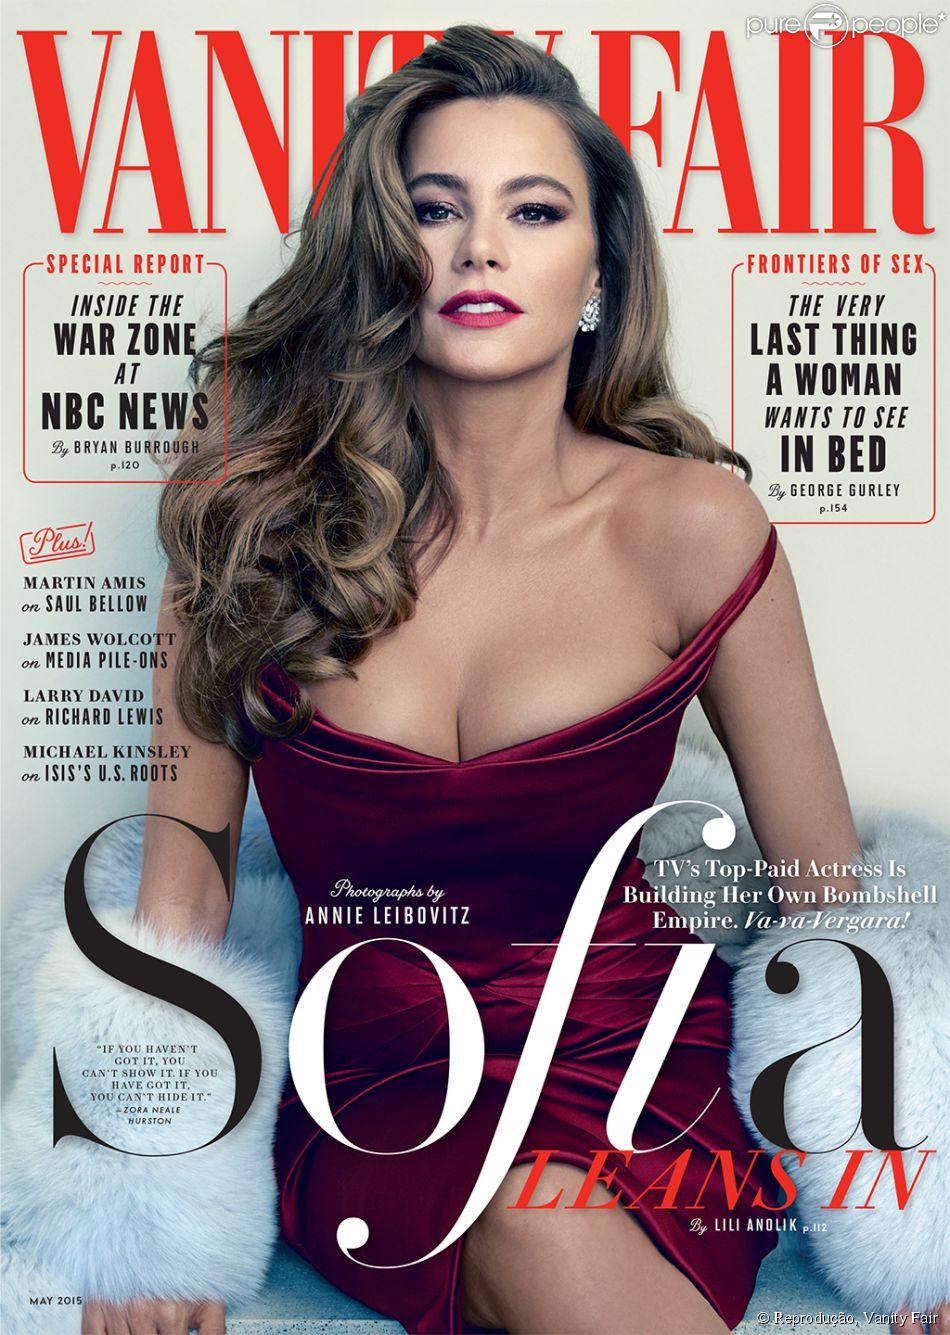 Símbolo sexual aos 42 anos, Sofia Vergara conta: 'Gostaria de ter seios falsos'